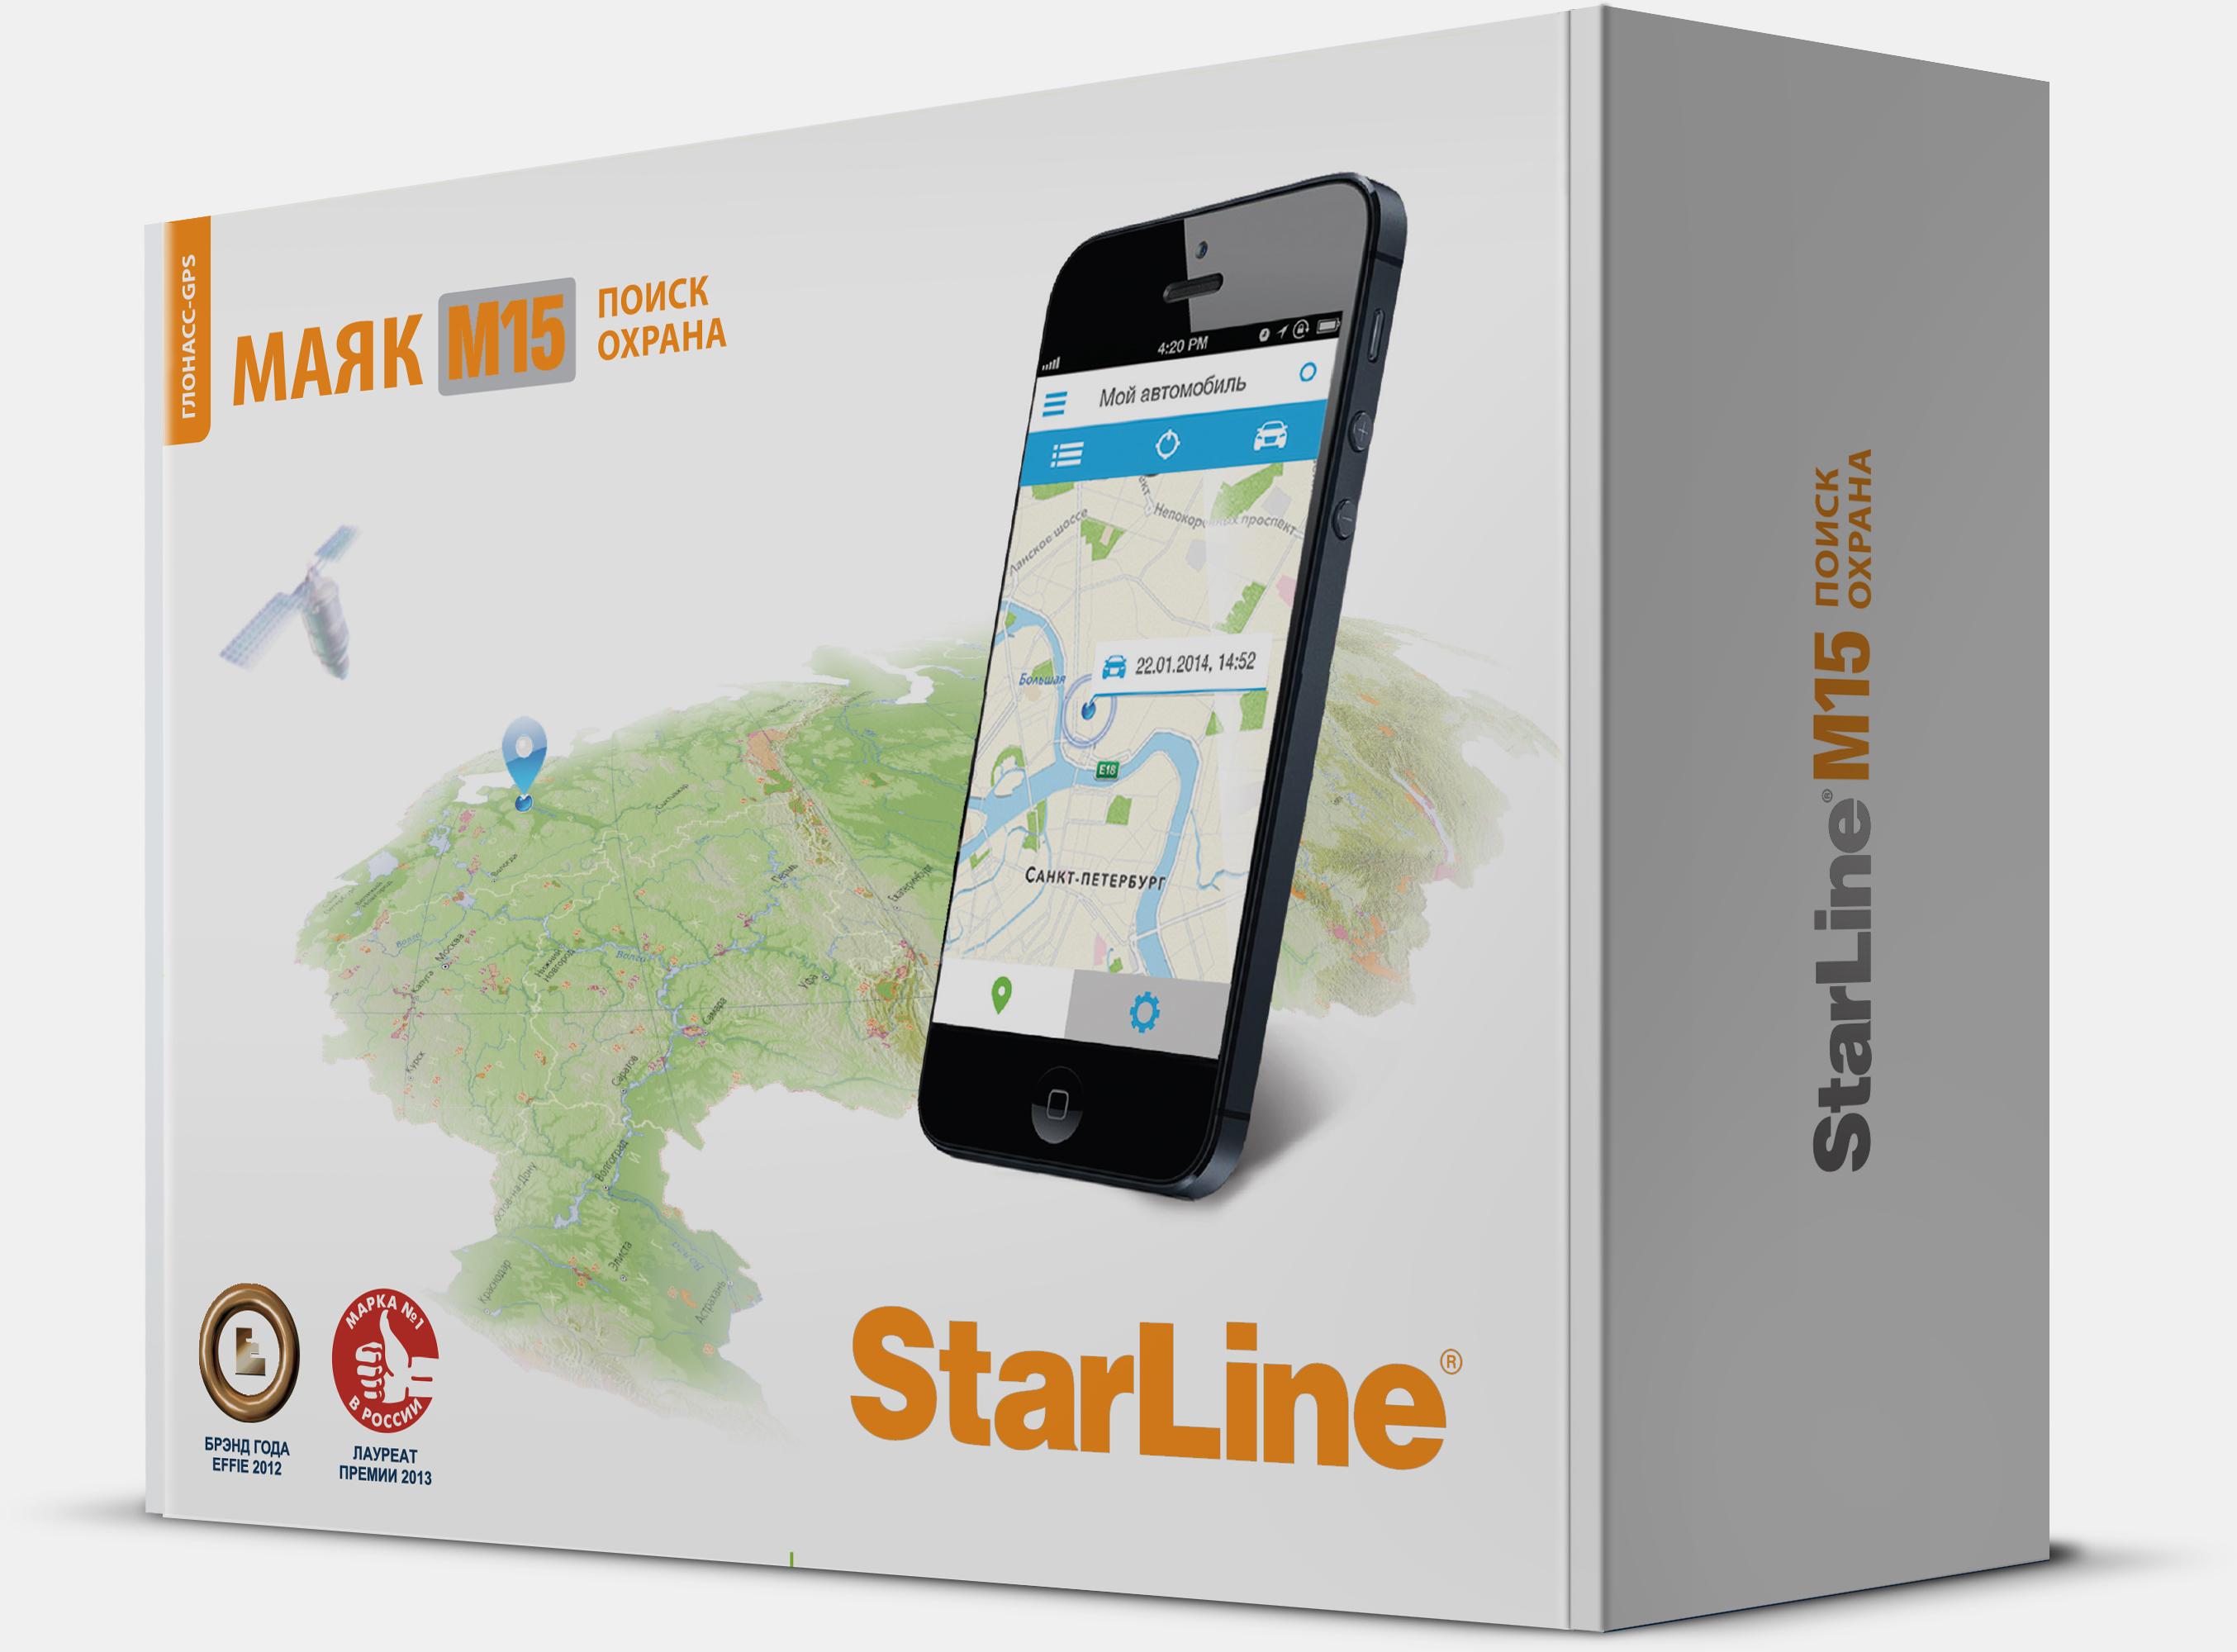 https://samara-starline.avto-guard.ru/wp-content/uploads/2017/08/Starline-M15.jpg 227x168